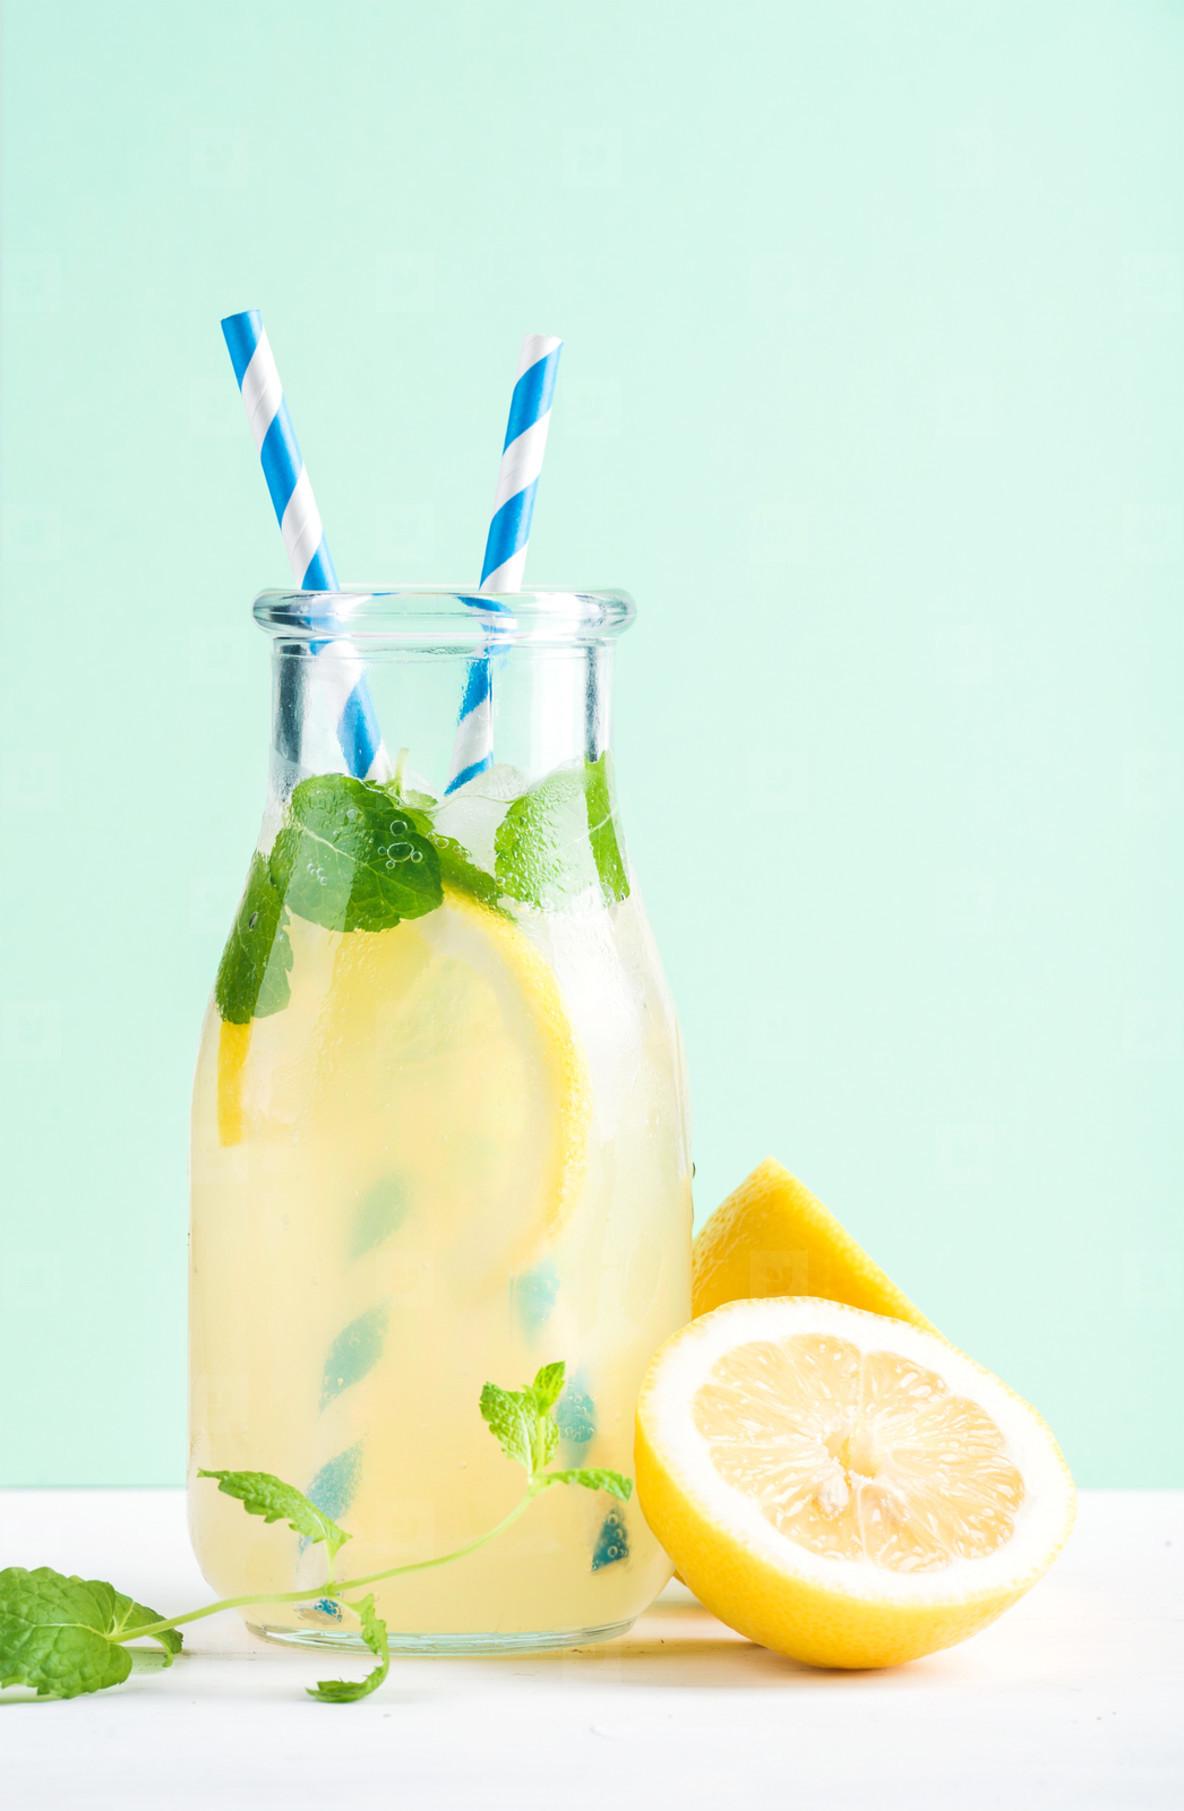 Bottle of homemade lemonade with mint  ice  lemons  paper straws and pastel blue background